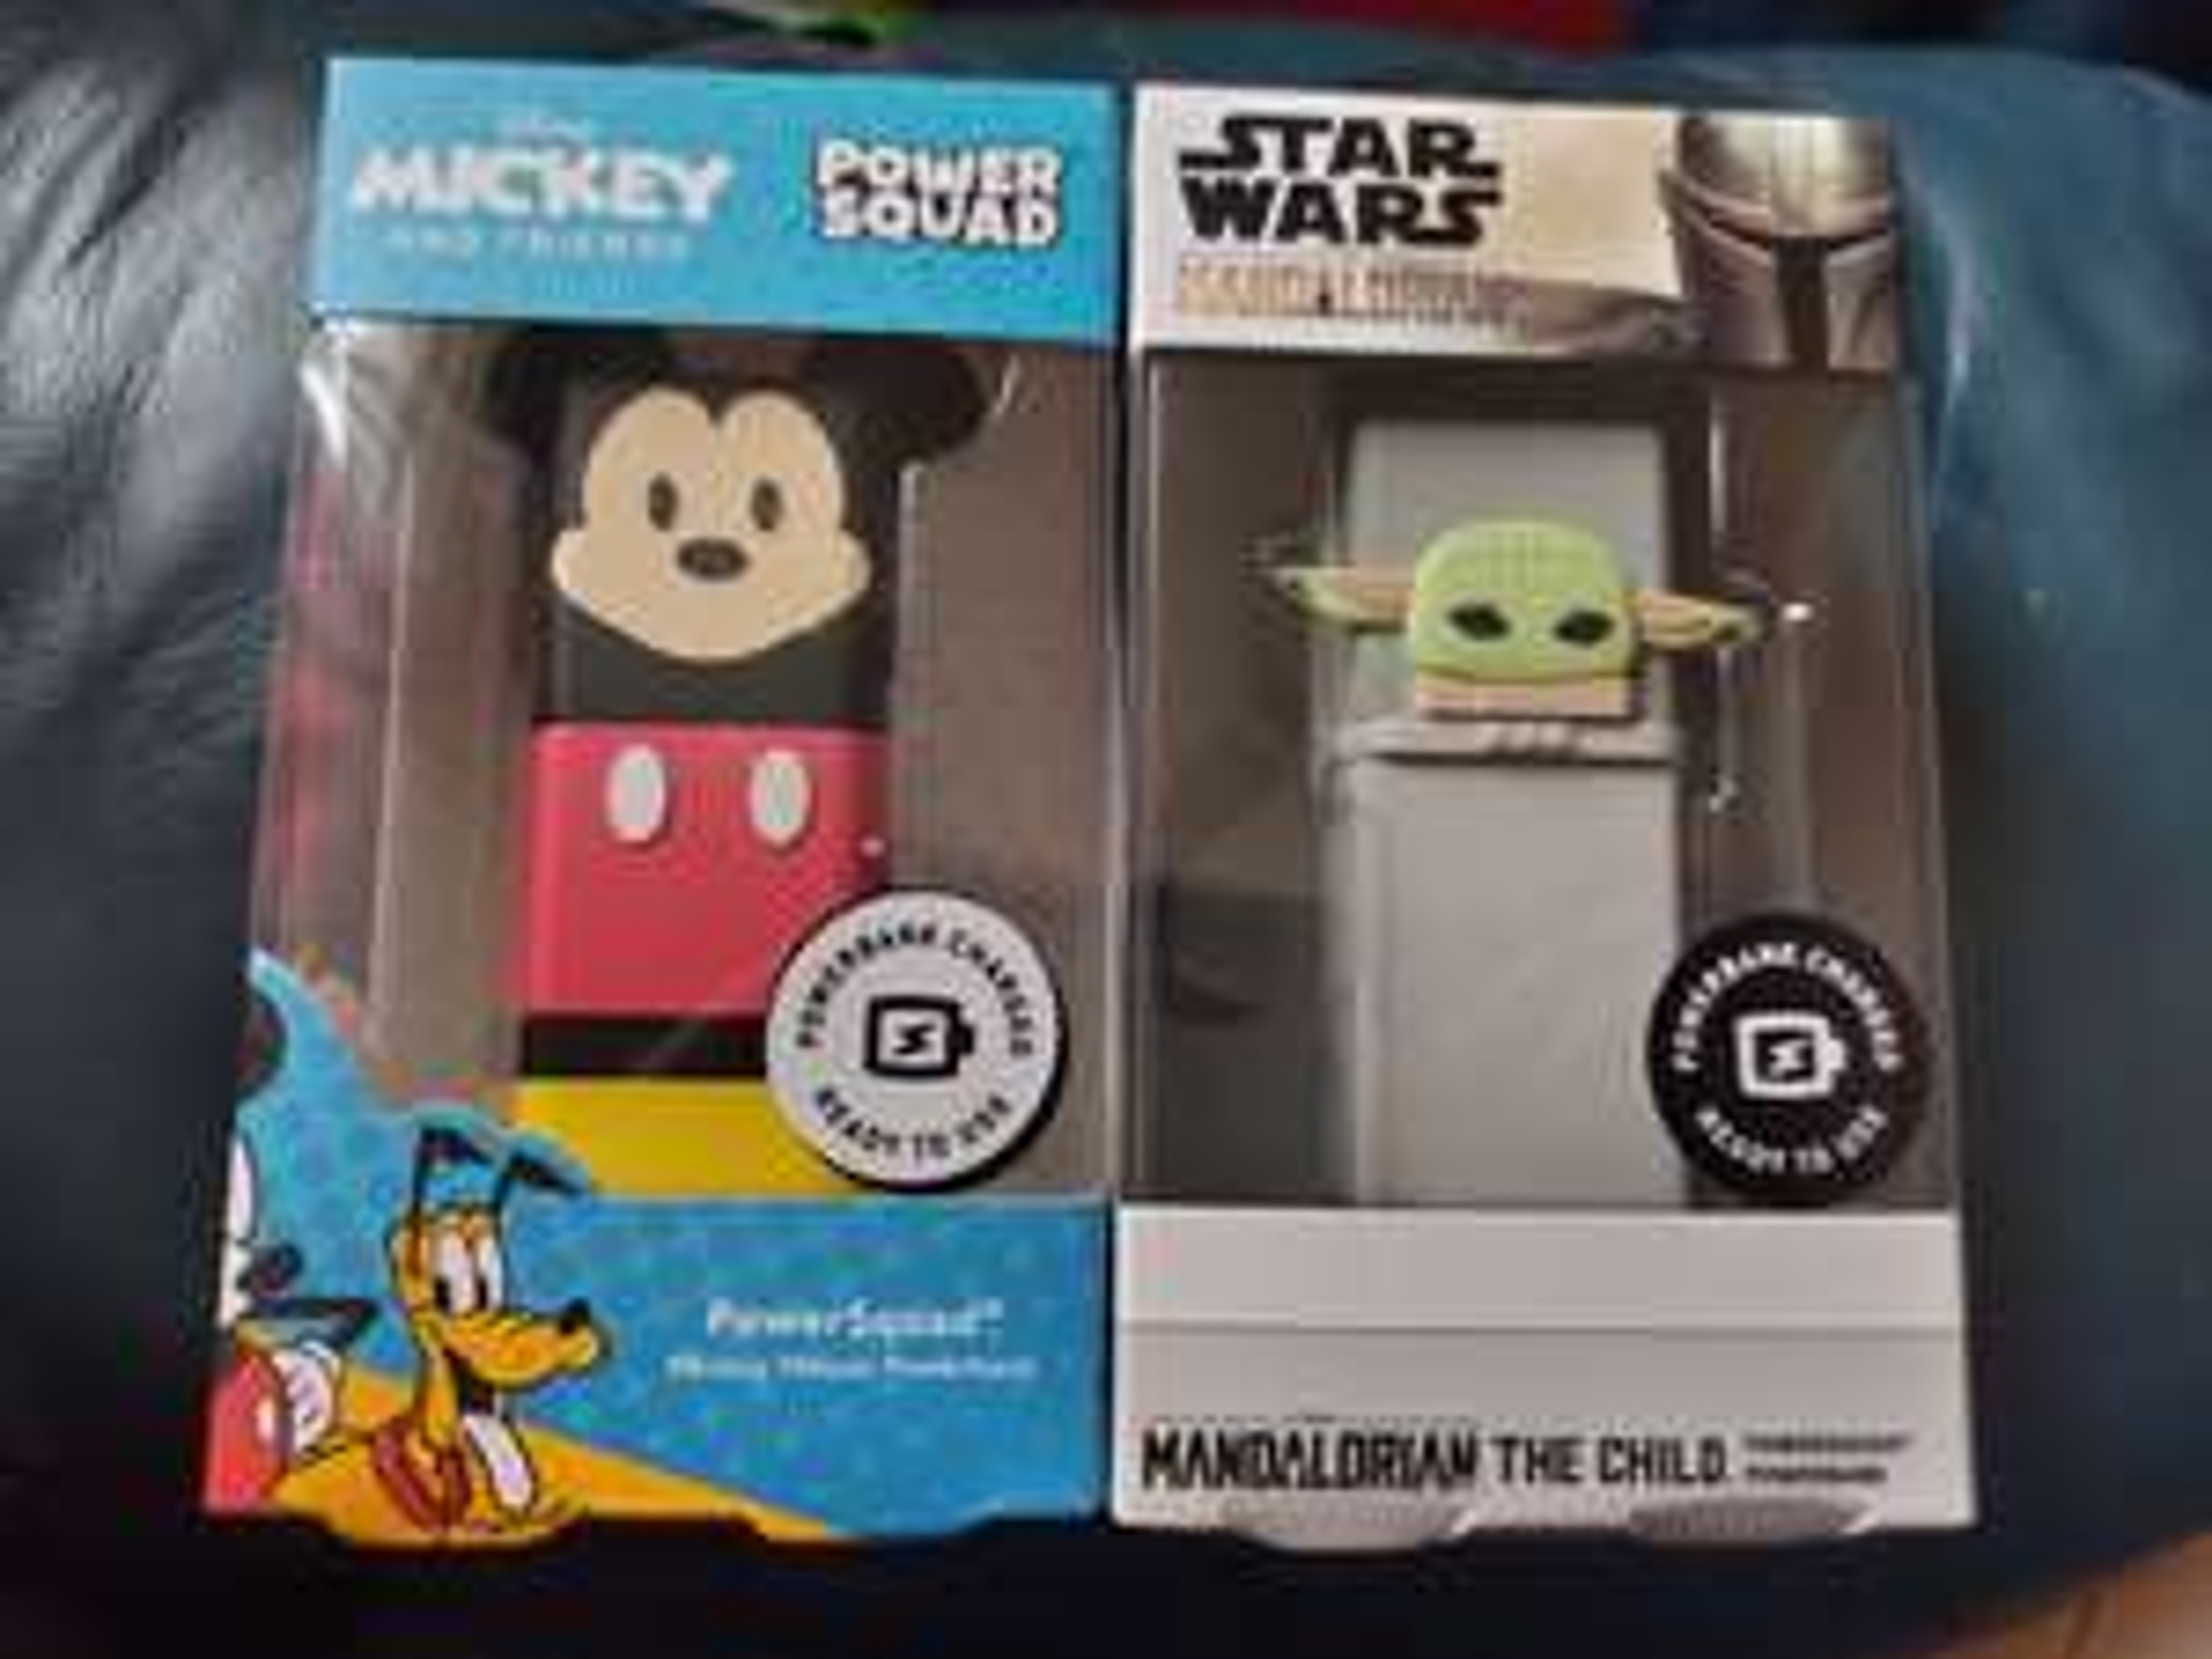 Disney Power Squad Power Banks 5000mAh £3.75 instore @ Asda Gateshead